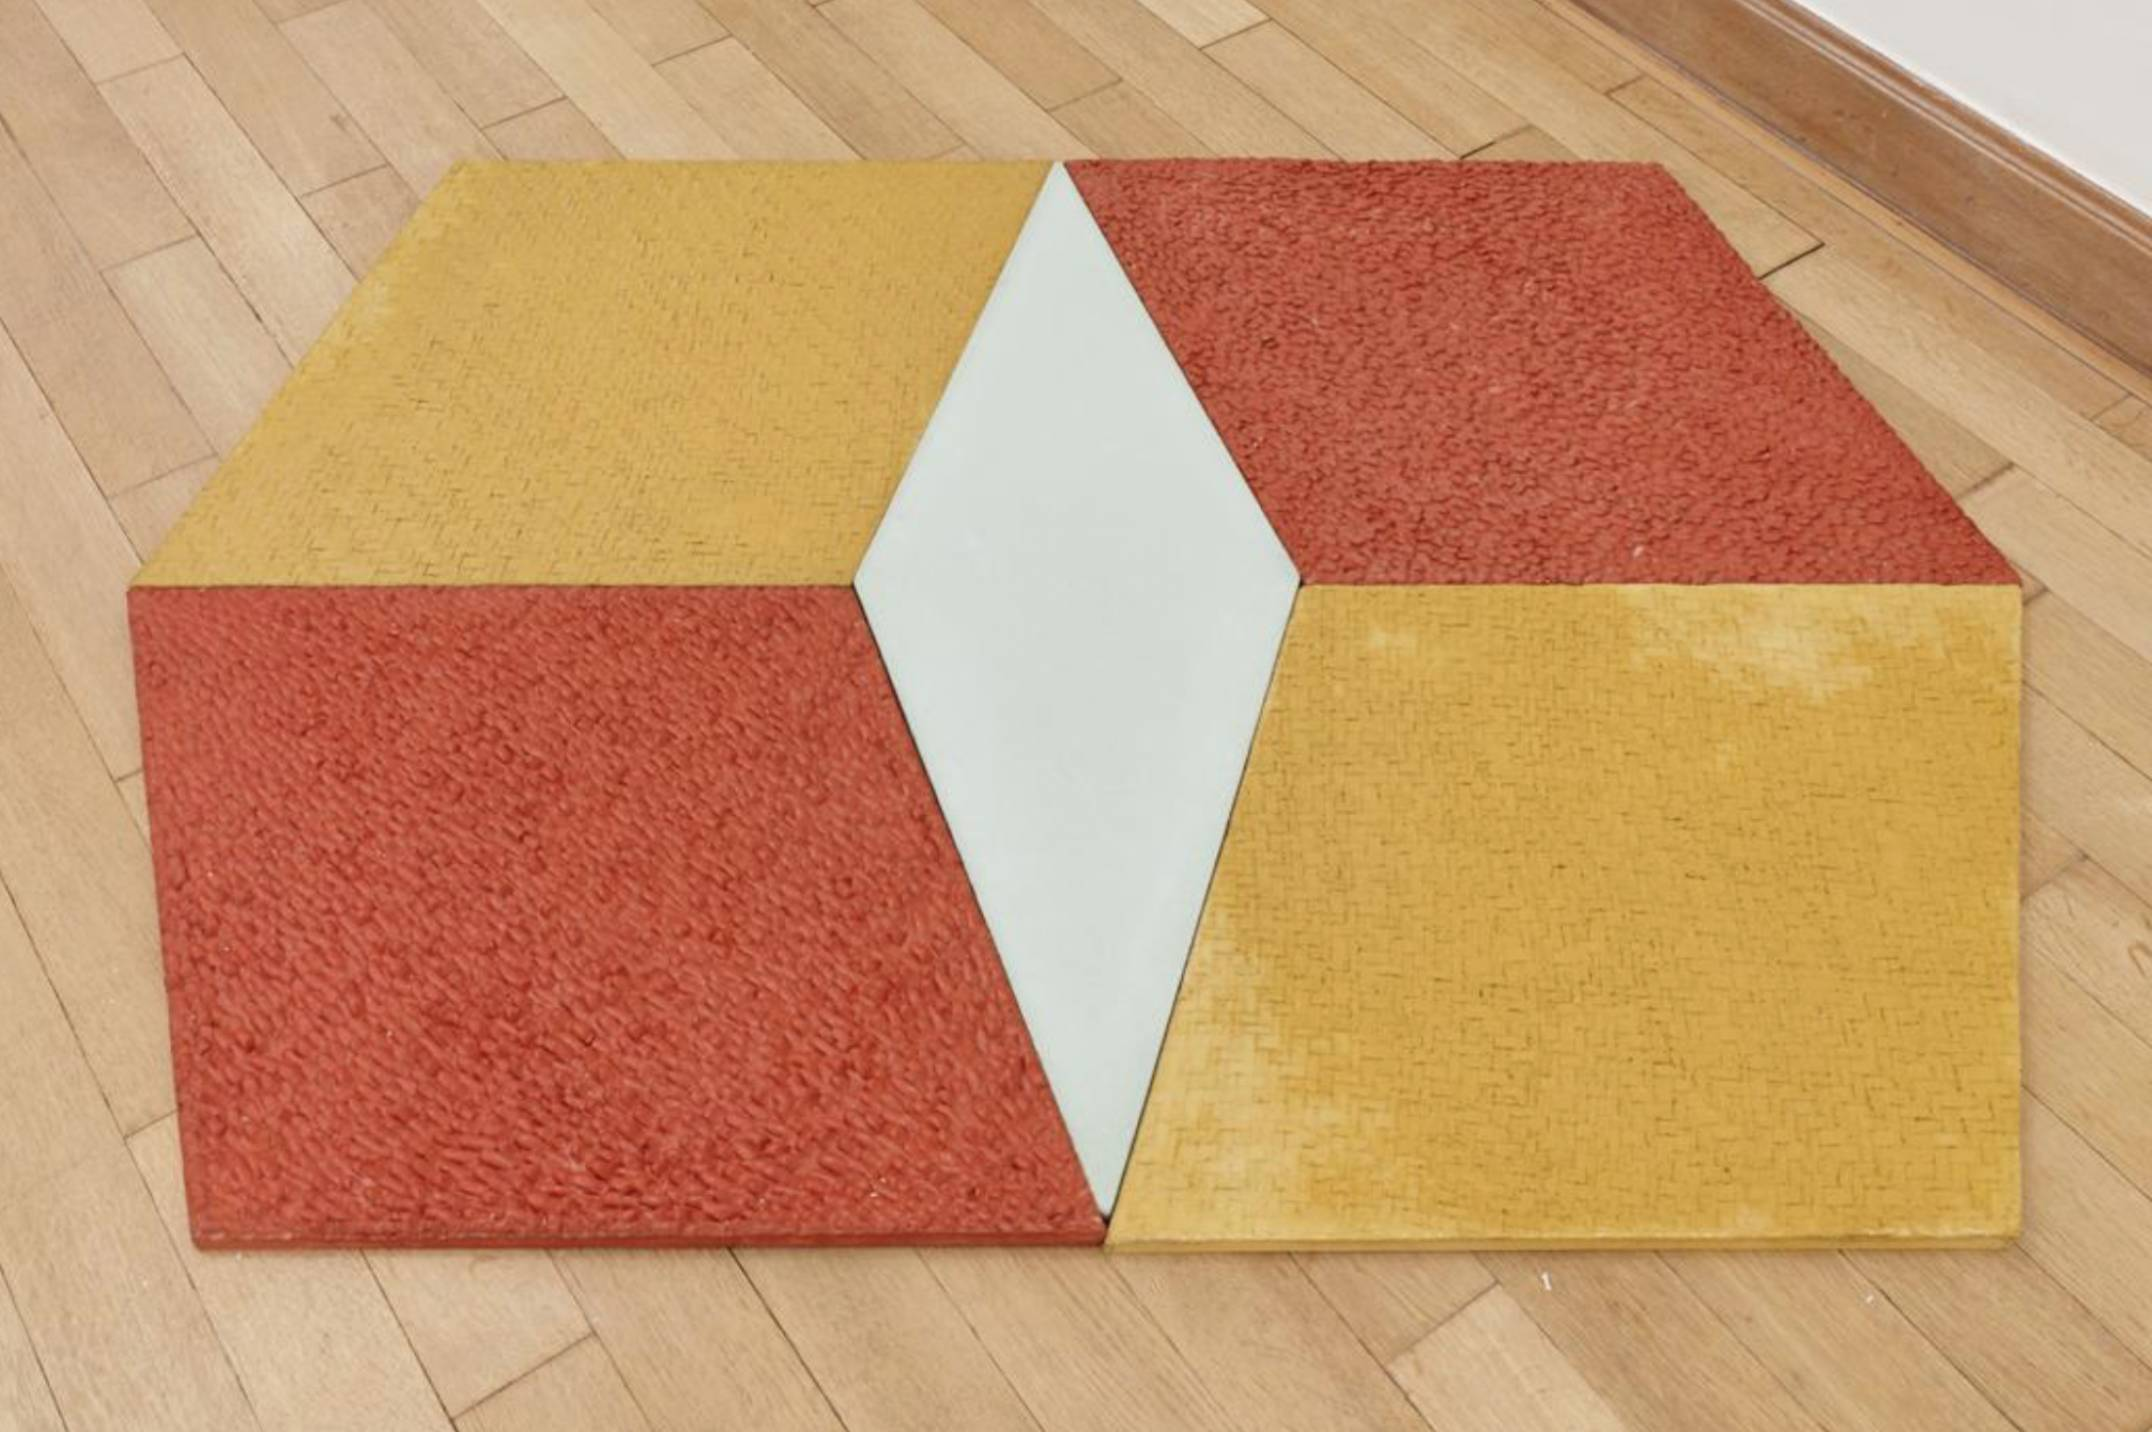 Mariana Castillo Deball, <em>Petate, Xipe, Turquesa, Xipe, Petate, </em>2017, colored concrete tiles with relief, 158 × 114 cm - Mendes Wood DM